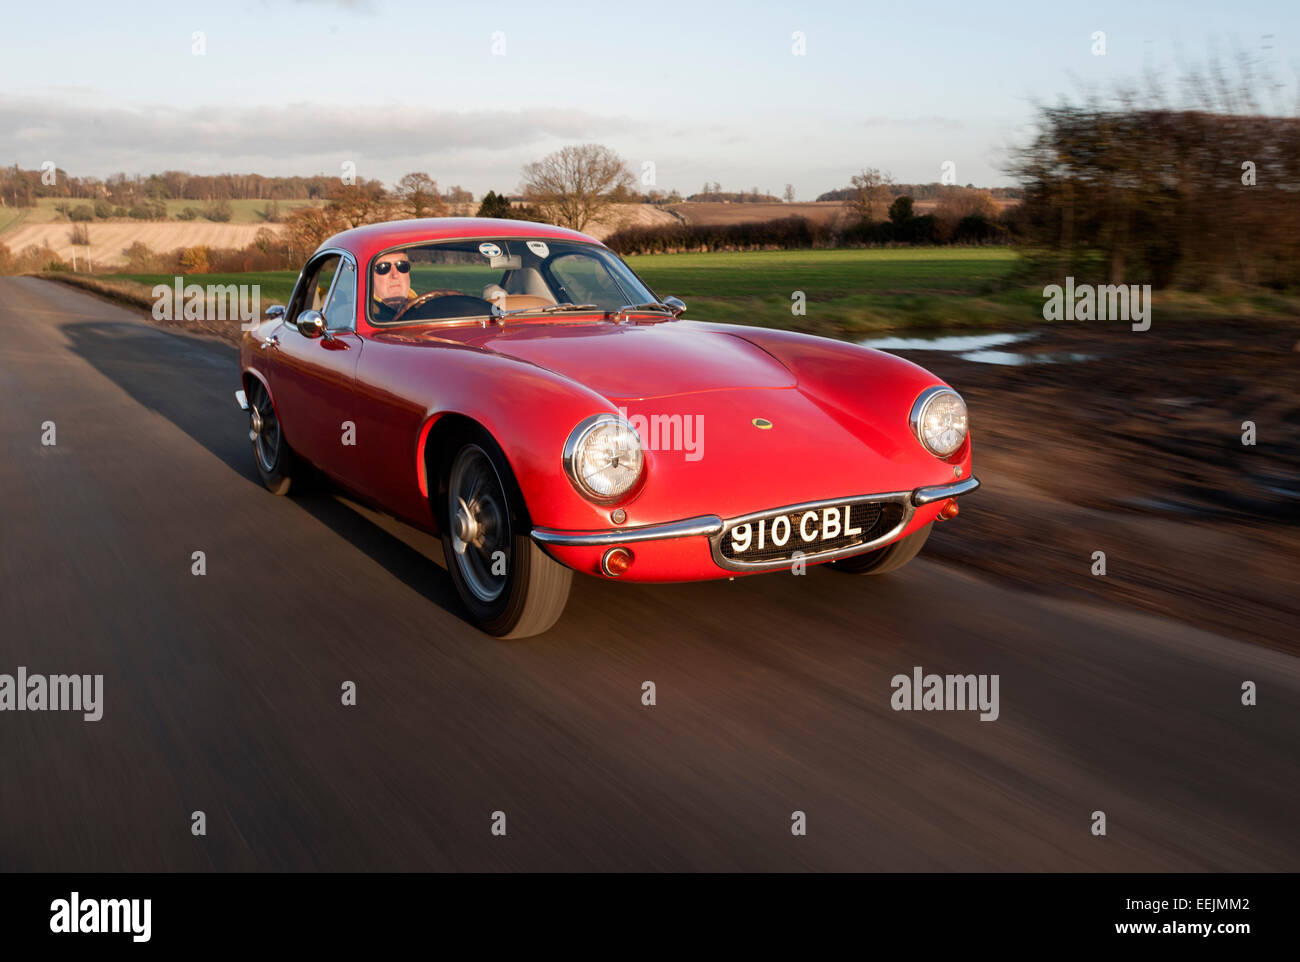 Awesome Lotus Elite Classic Car   Stock Image